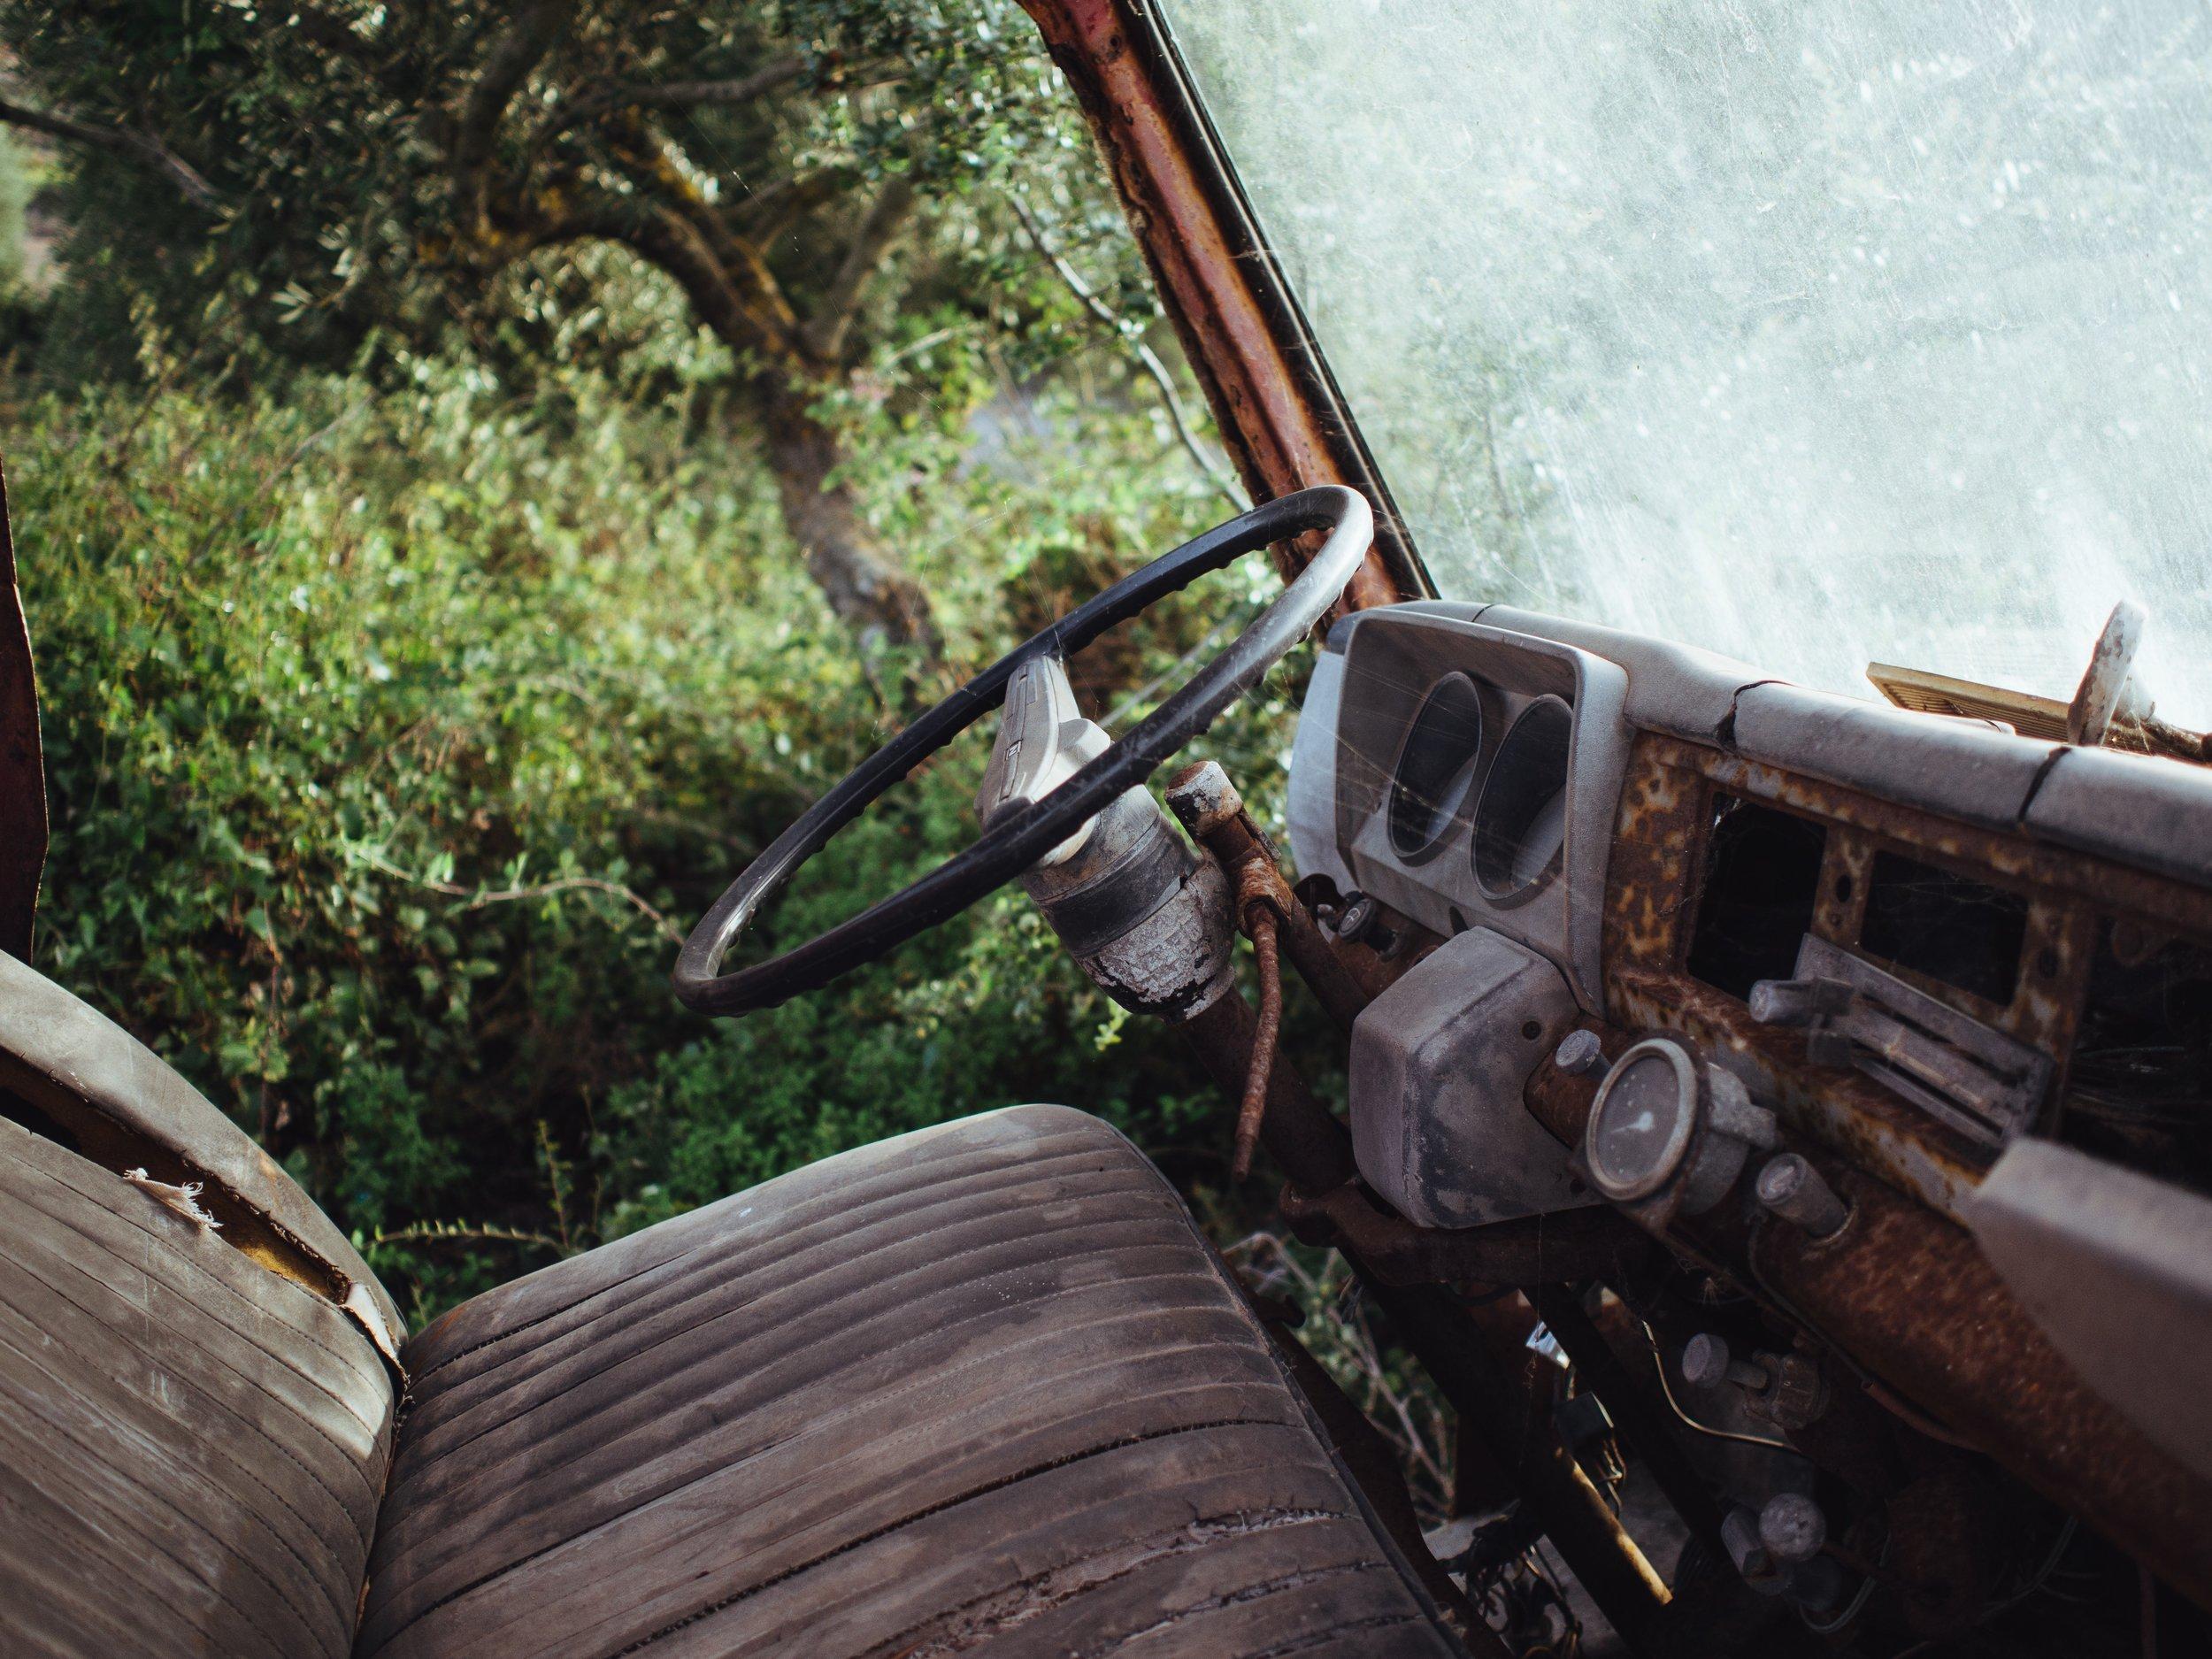 broken-car-vehicle-rust.jpeg